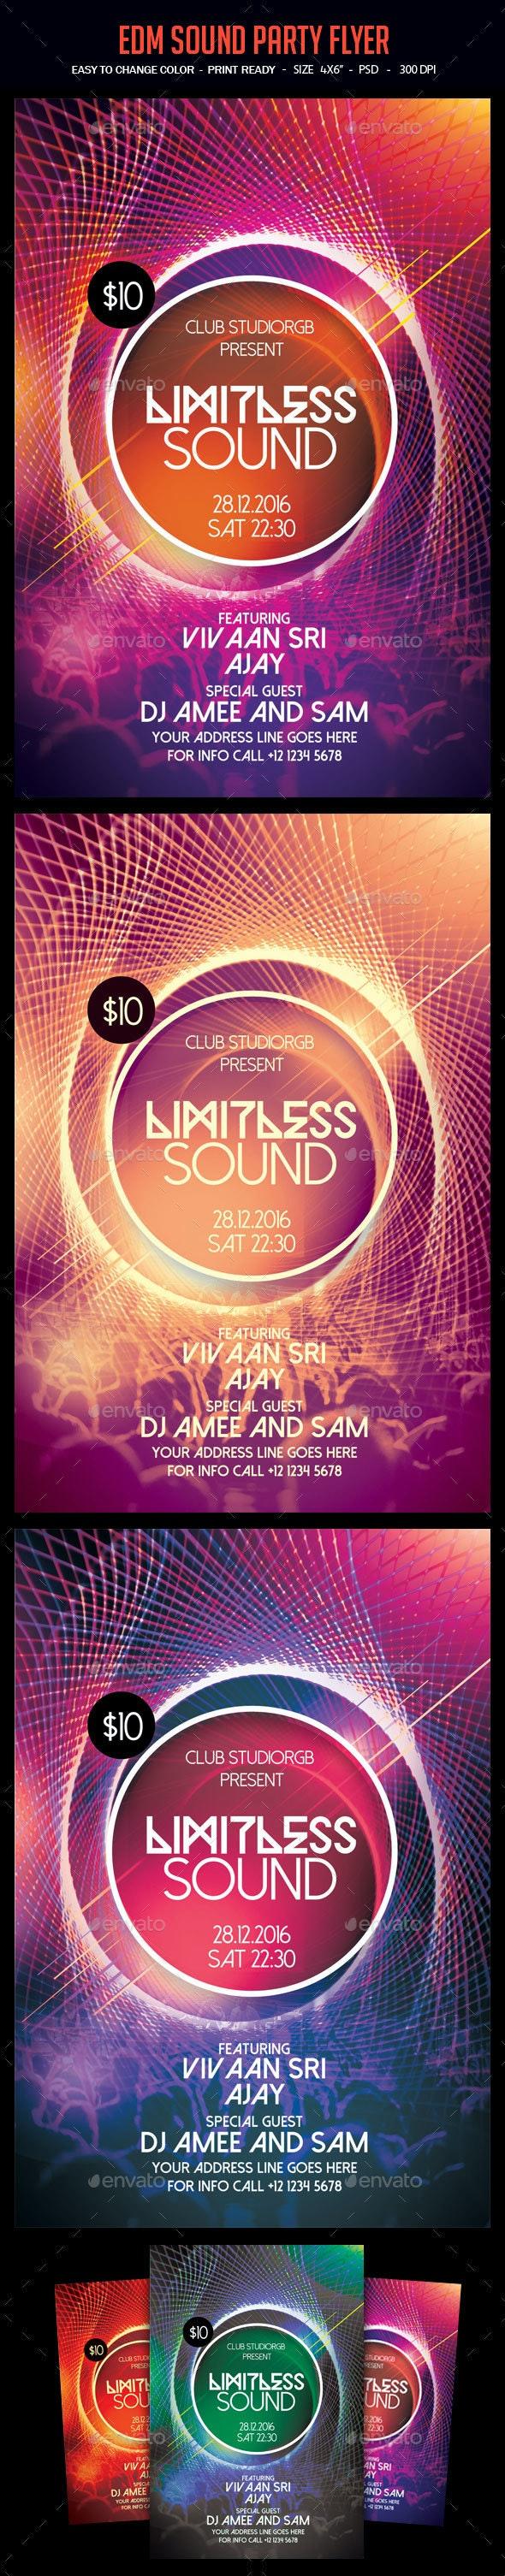 EDM Sound Party Flyer - Clubs & Parties Events